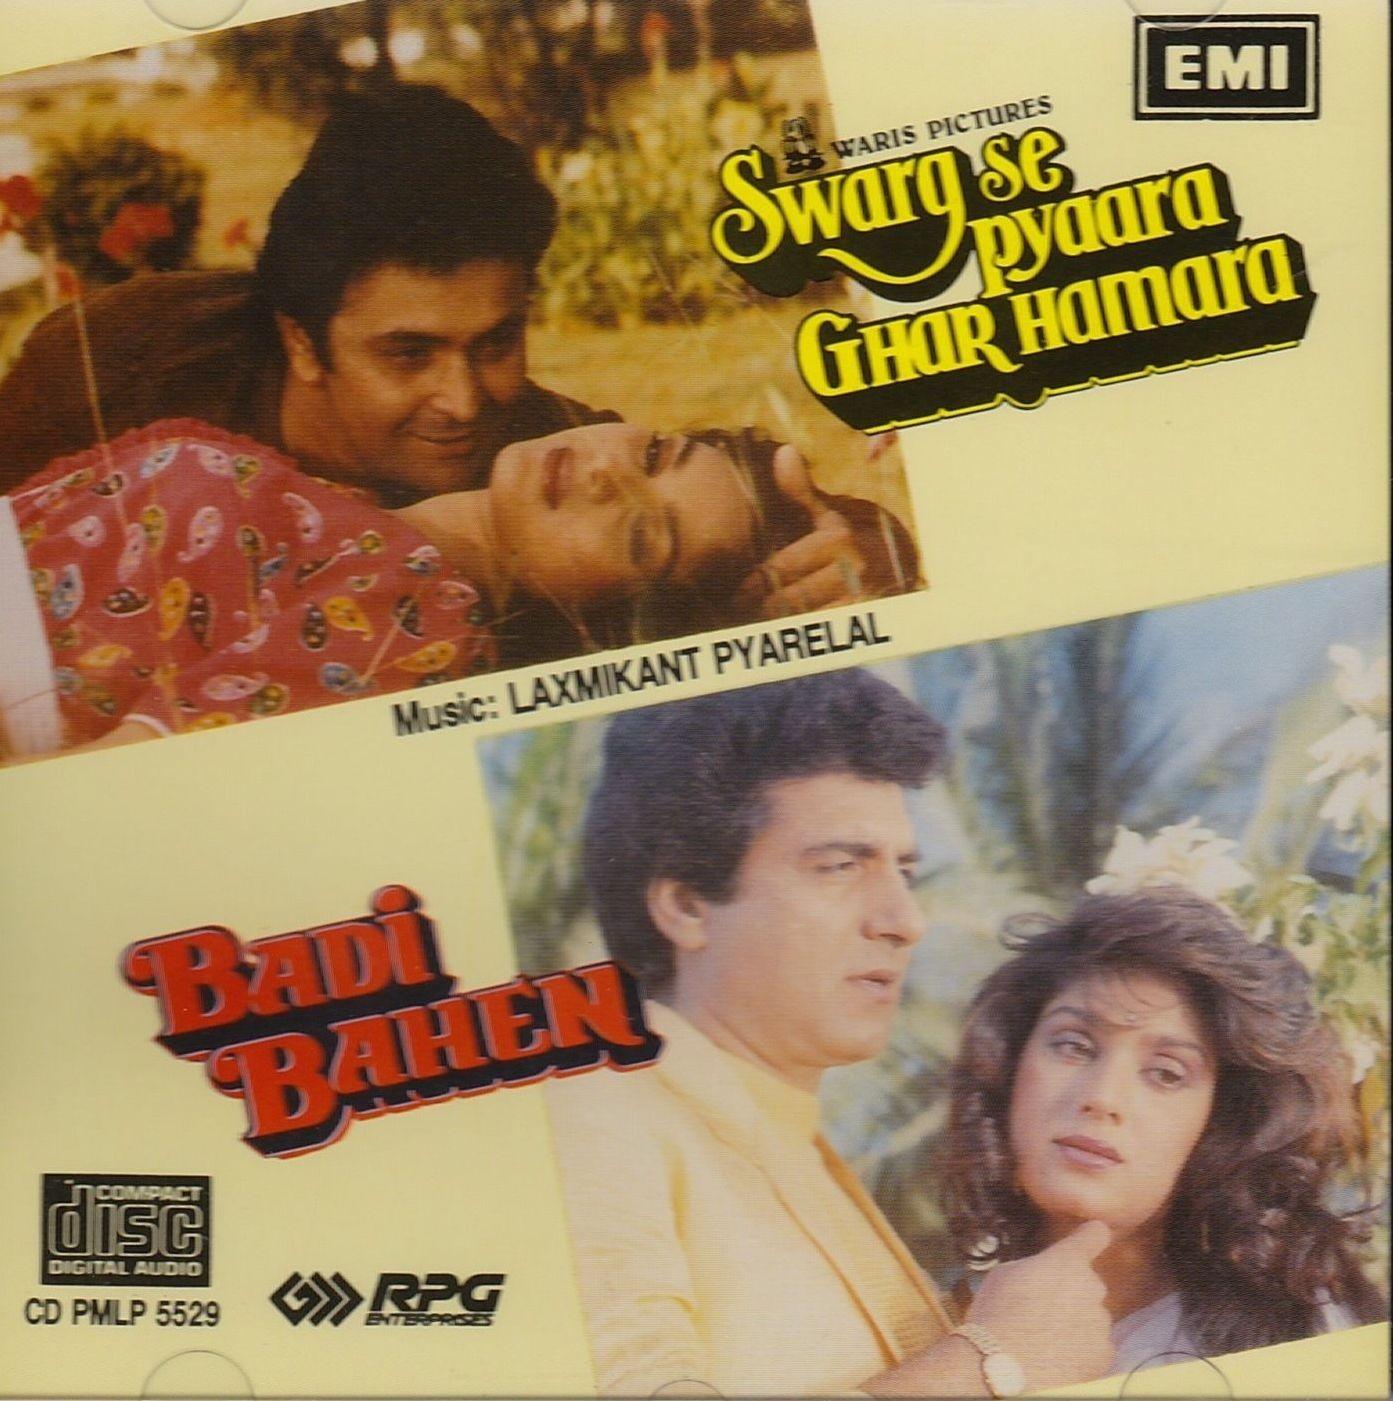 essay on bharat desh hamara sabse pyaara Madhubala (14 february 1933 – 20 february 1969) (born mumtaz jehan dehlavi ) was a indian film actress who appeared in classic films of hindi cinema she was active between 1942 and 1962.